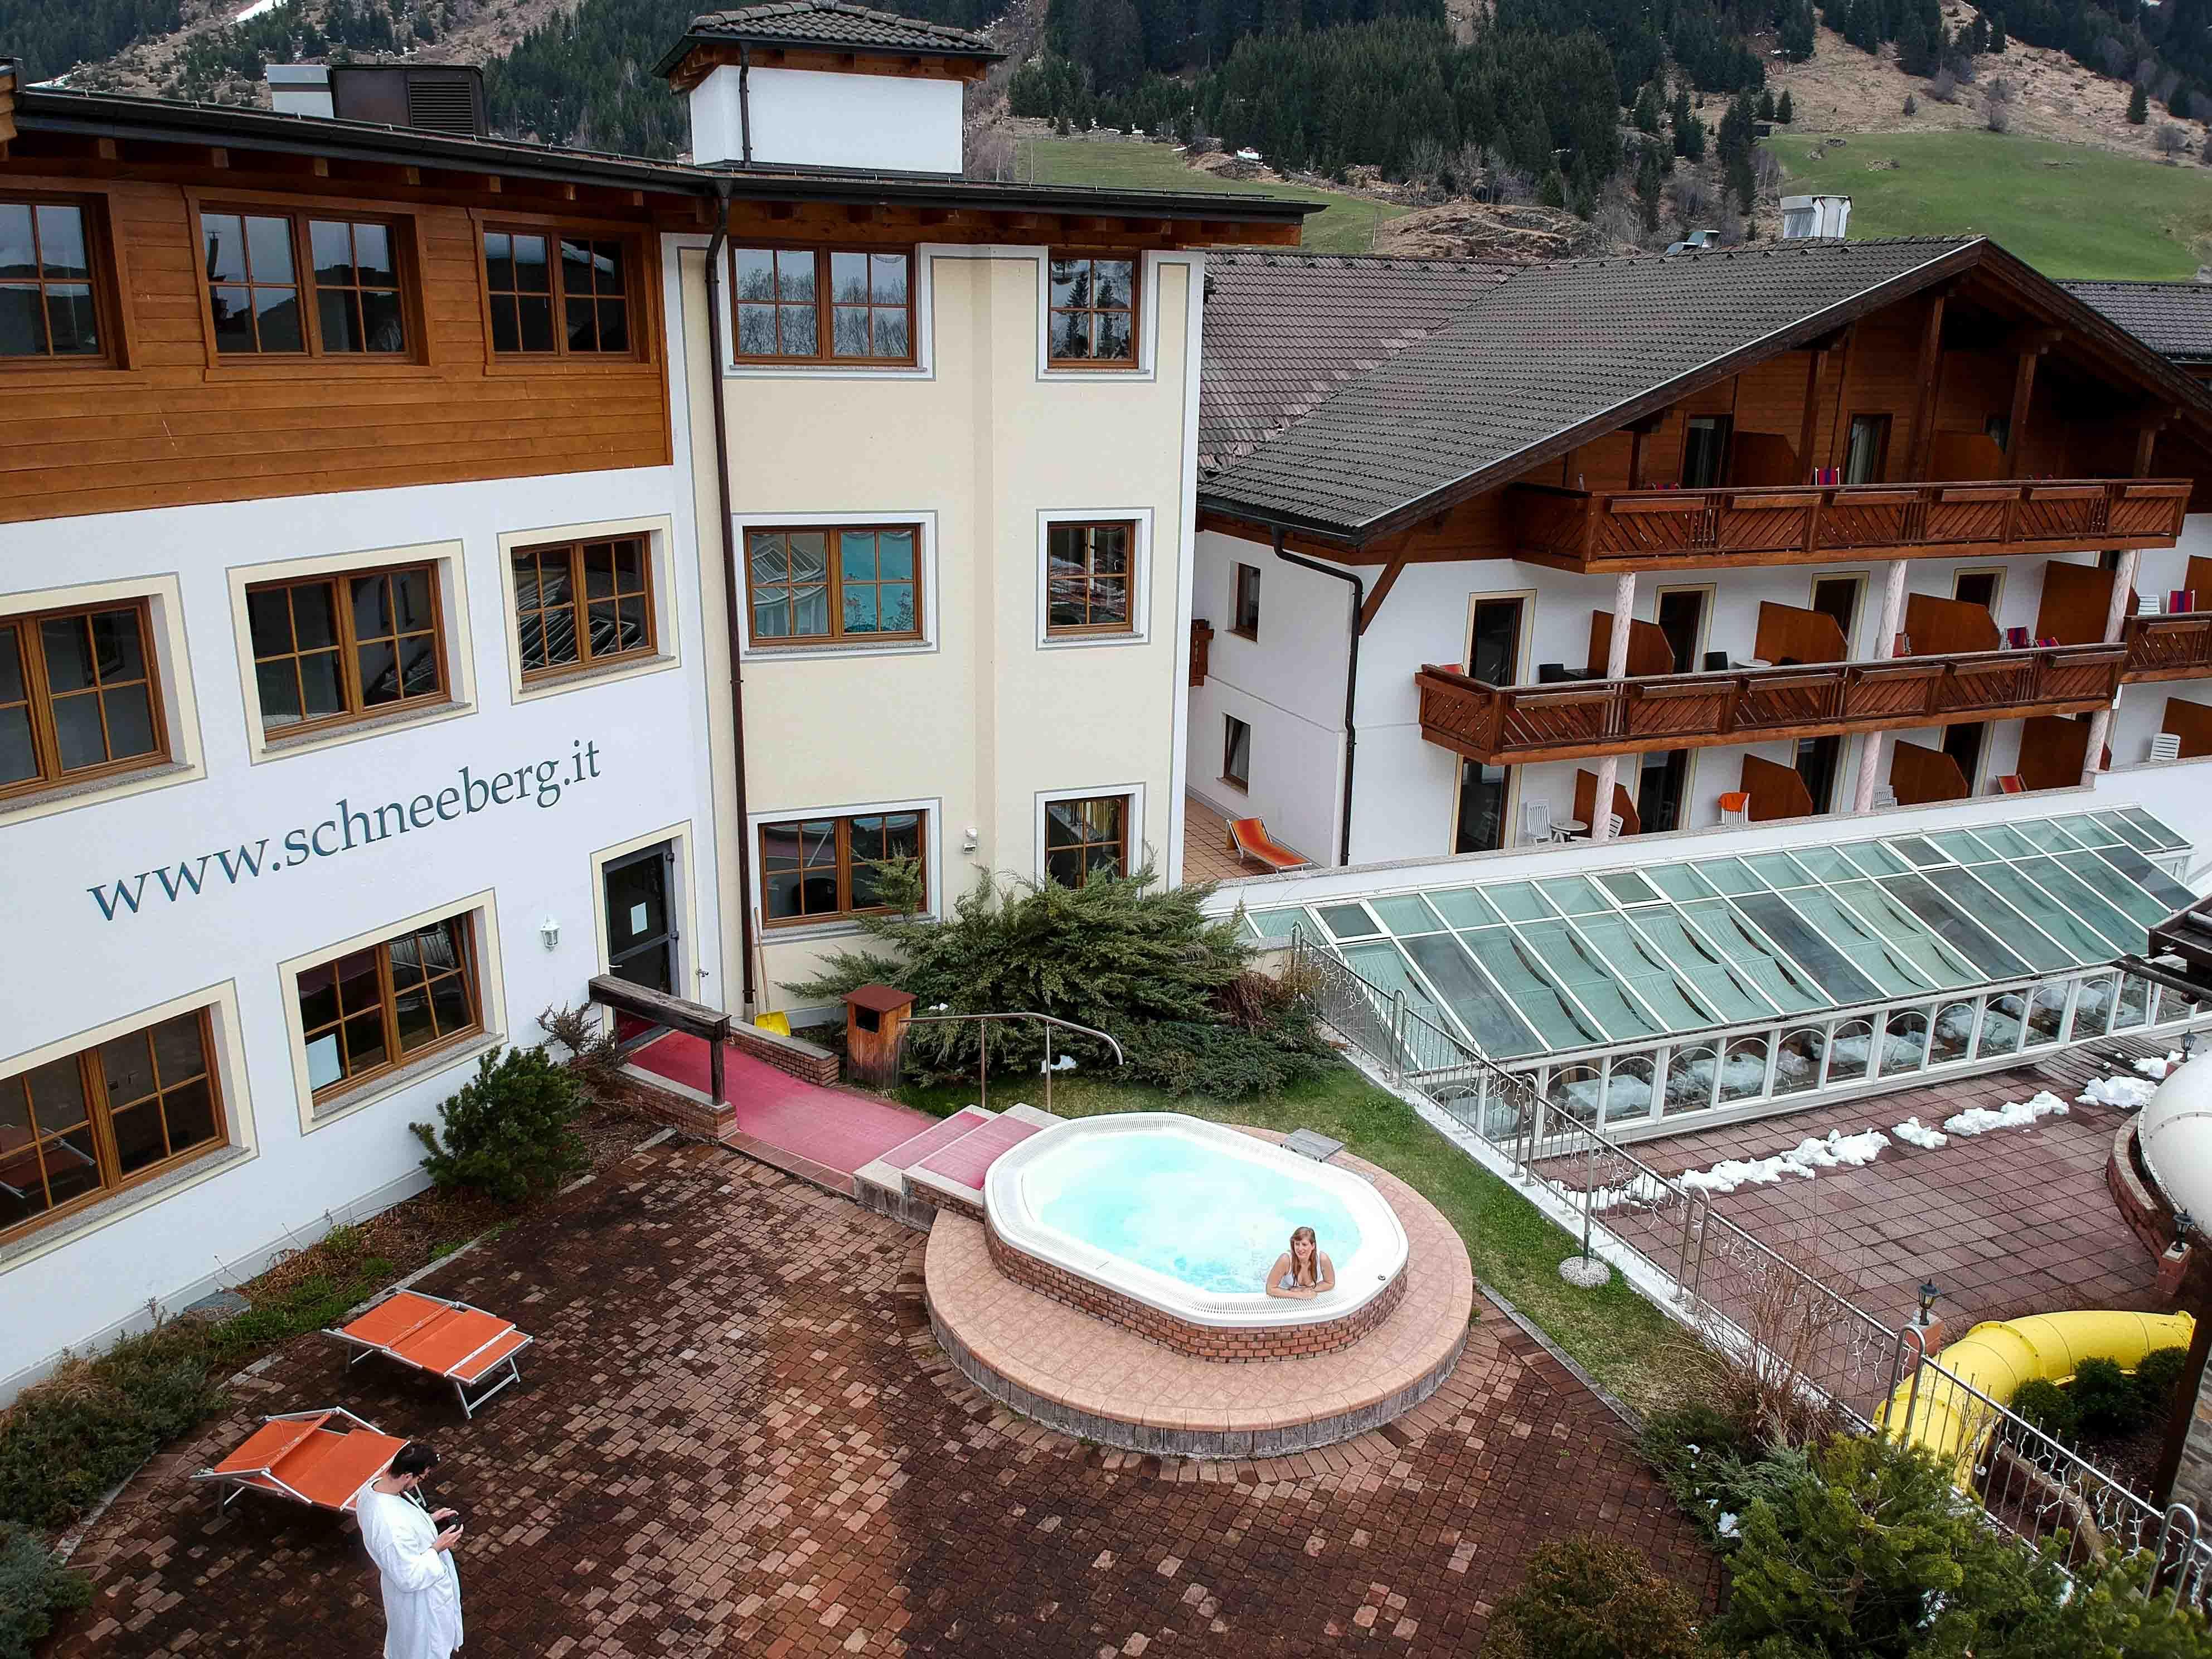 Whirlpool-Wellnessparadies-Südtirol-Hotel-Schneeberg-Italien-Wellnesshotel-Reiseblog-Wellnessurlaub-Kurzurlaub